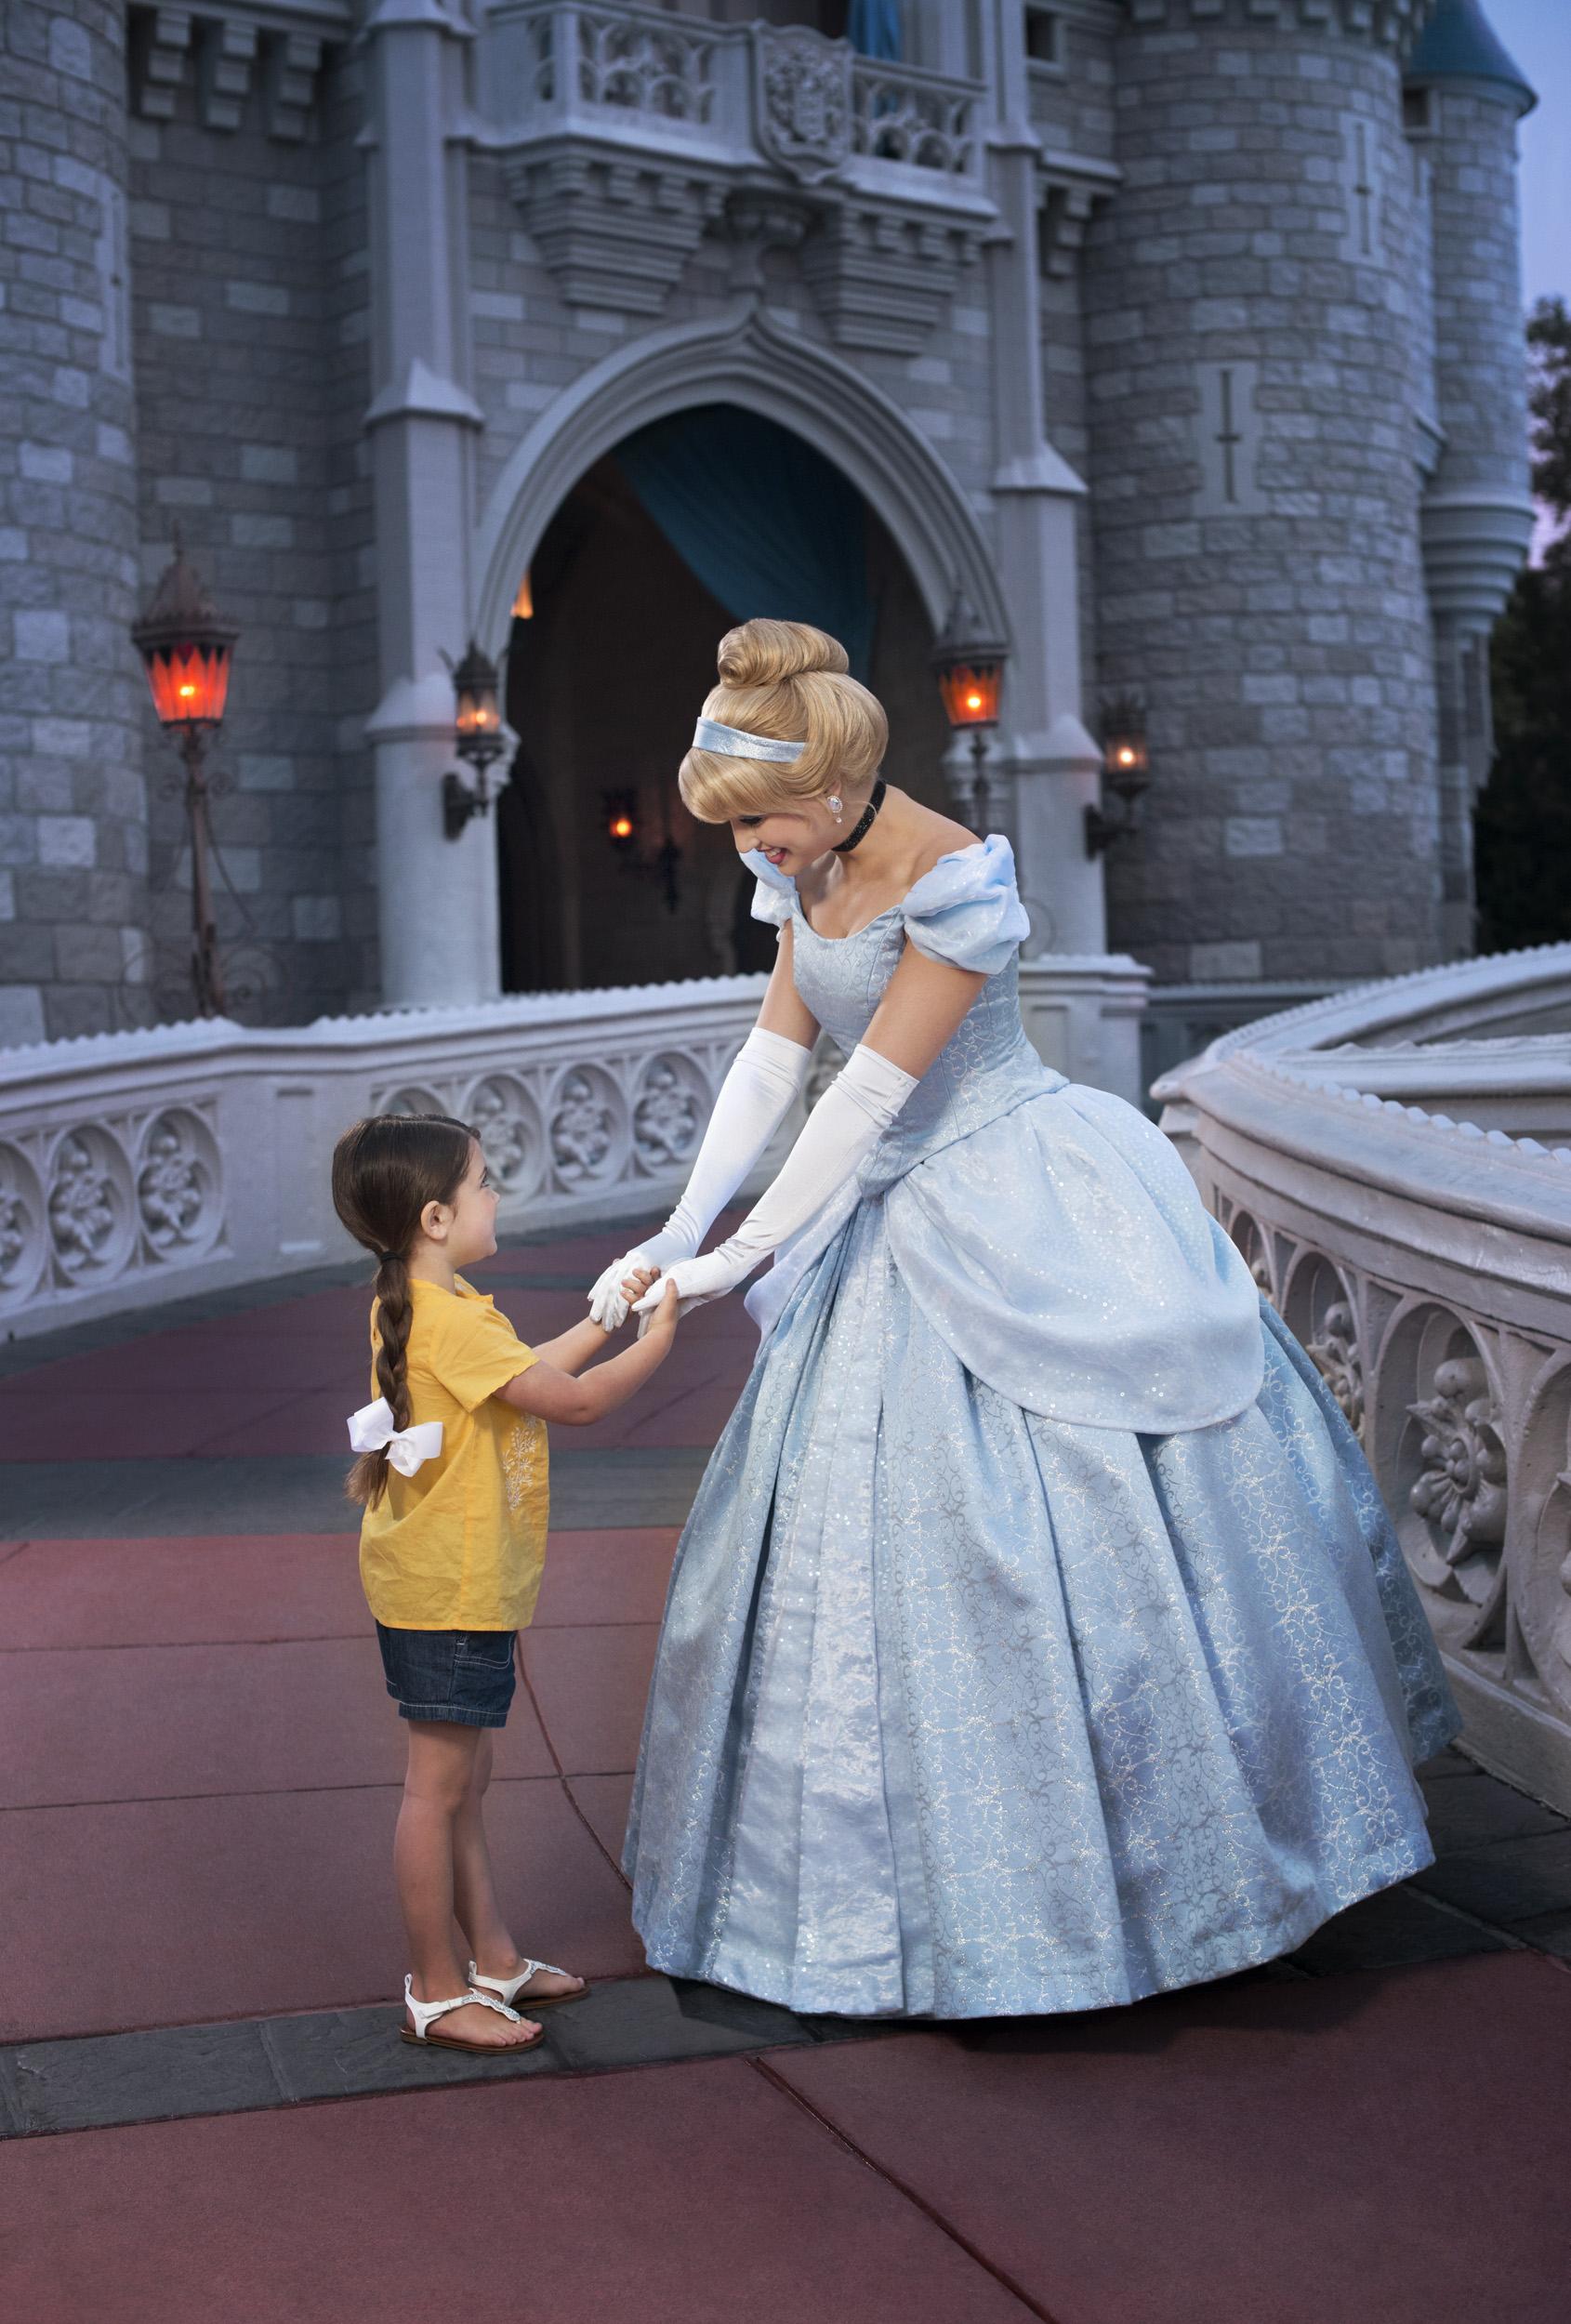 Cinderella_084 (1)ms.jpg